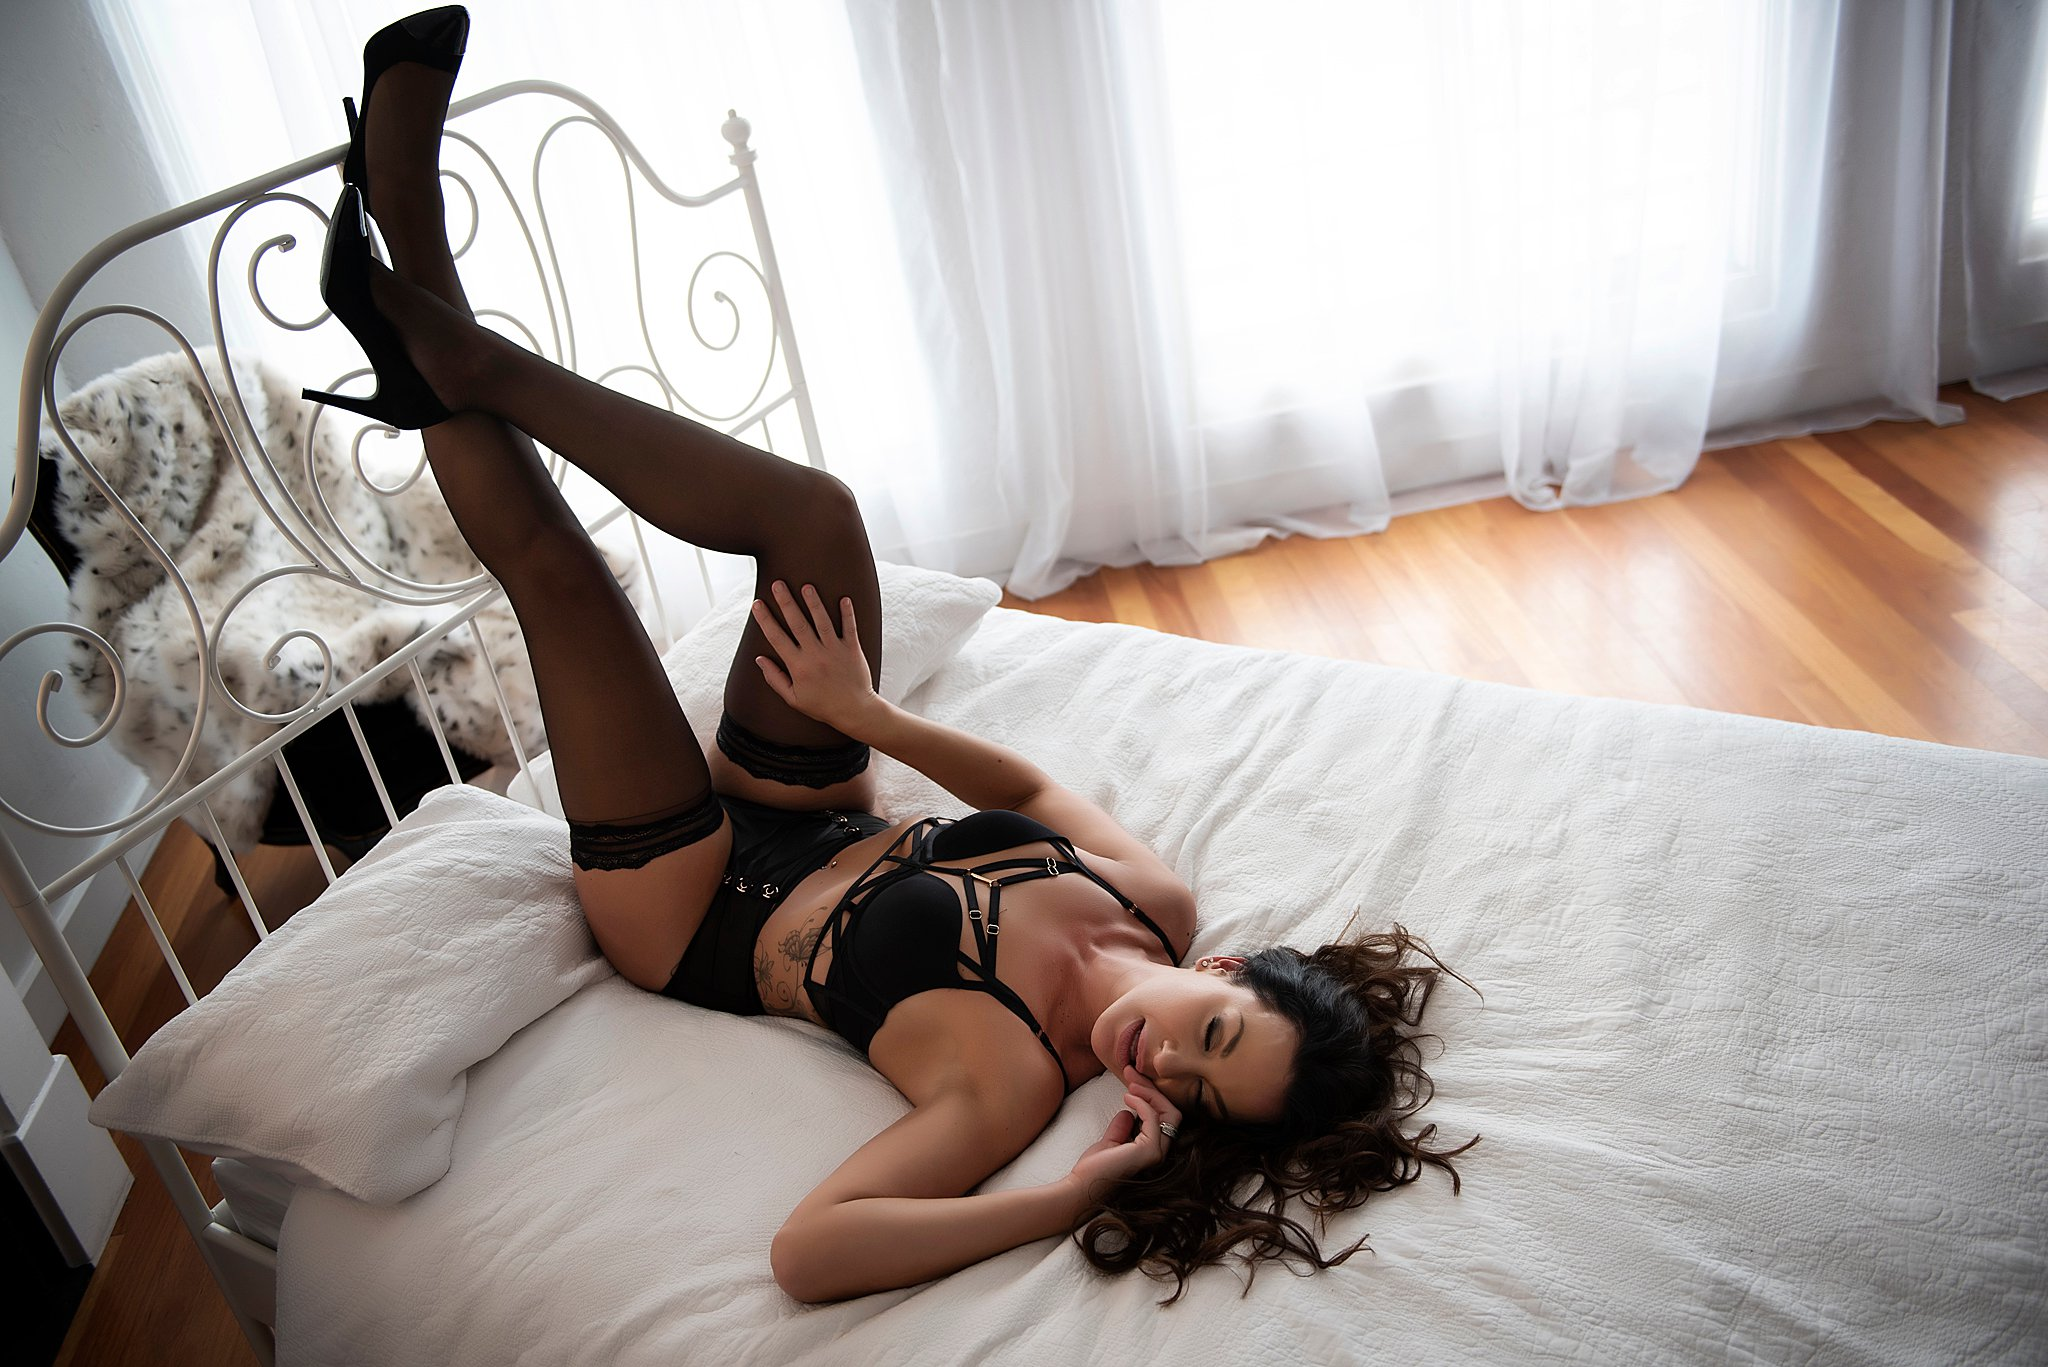 Intimate-boudoir-photoshoot-008.jpg